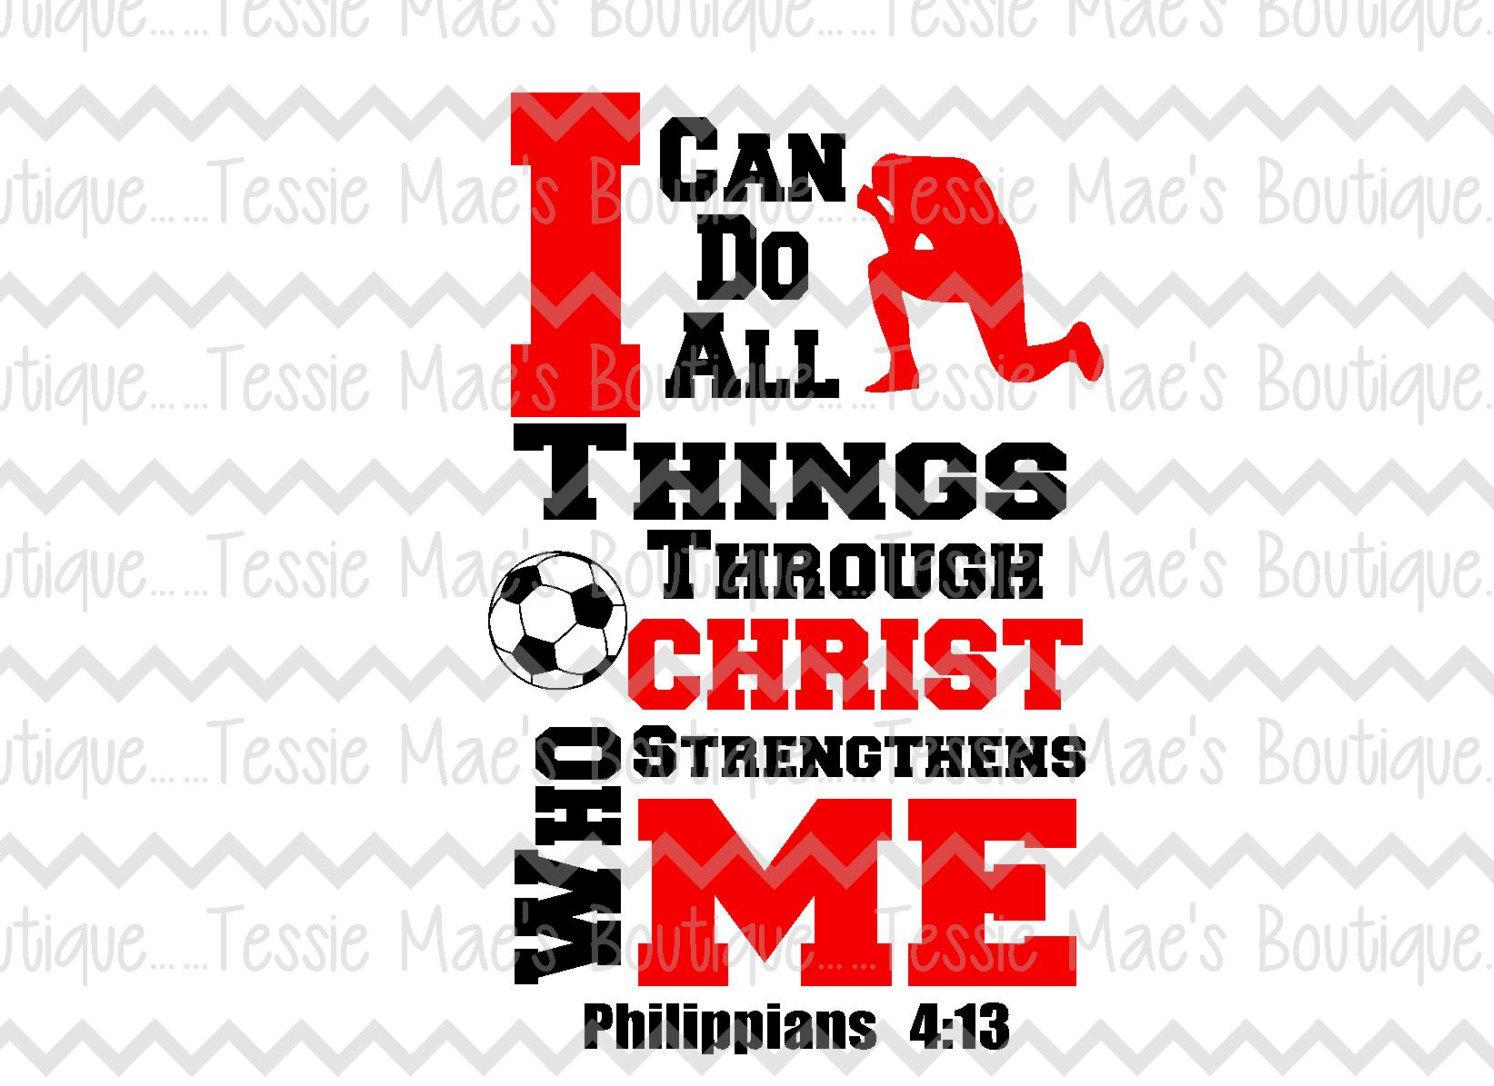 T shirt design jonesboro ar - I Can Do All Things Through Christ Soccer Svg Dxf Eps Instant Download Digital Design Religious Shirt Soccer Shirt Soccer Mom Shirt